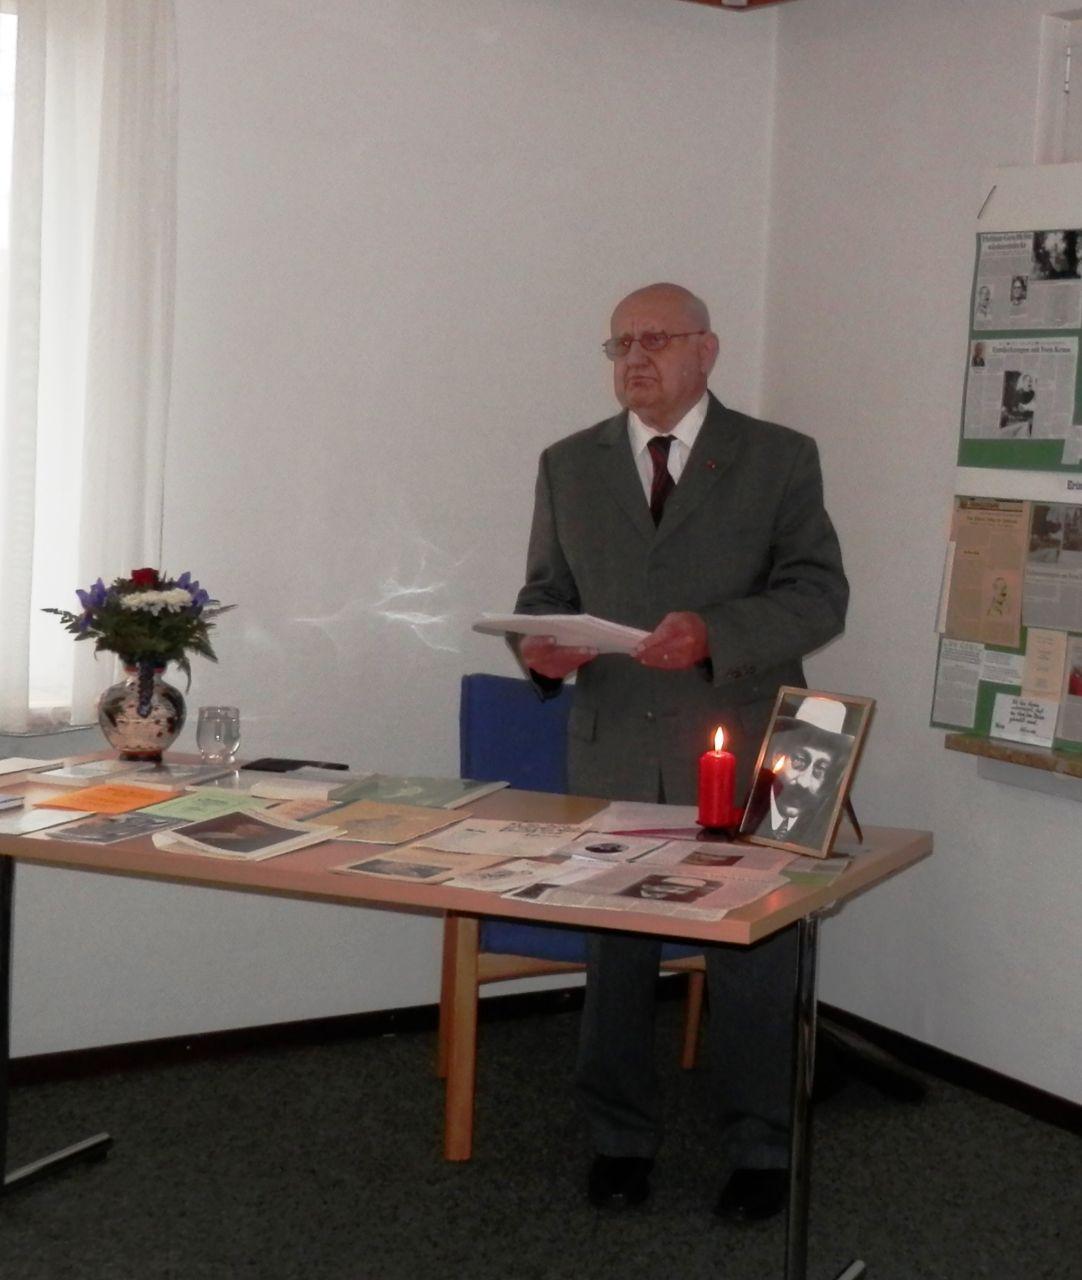 Harald Timmermann